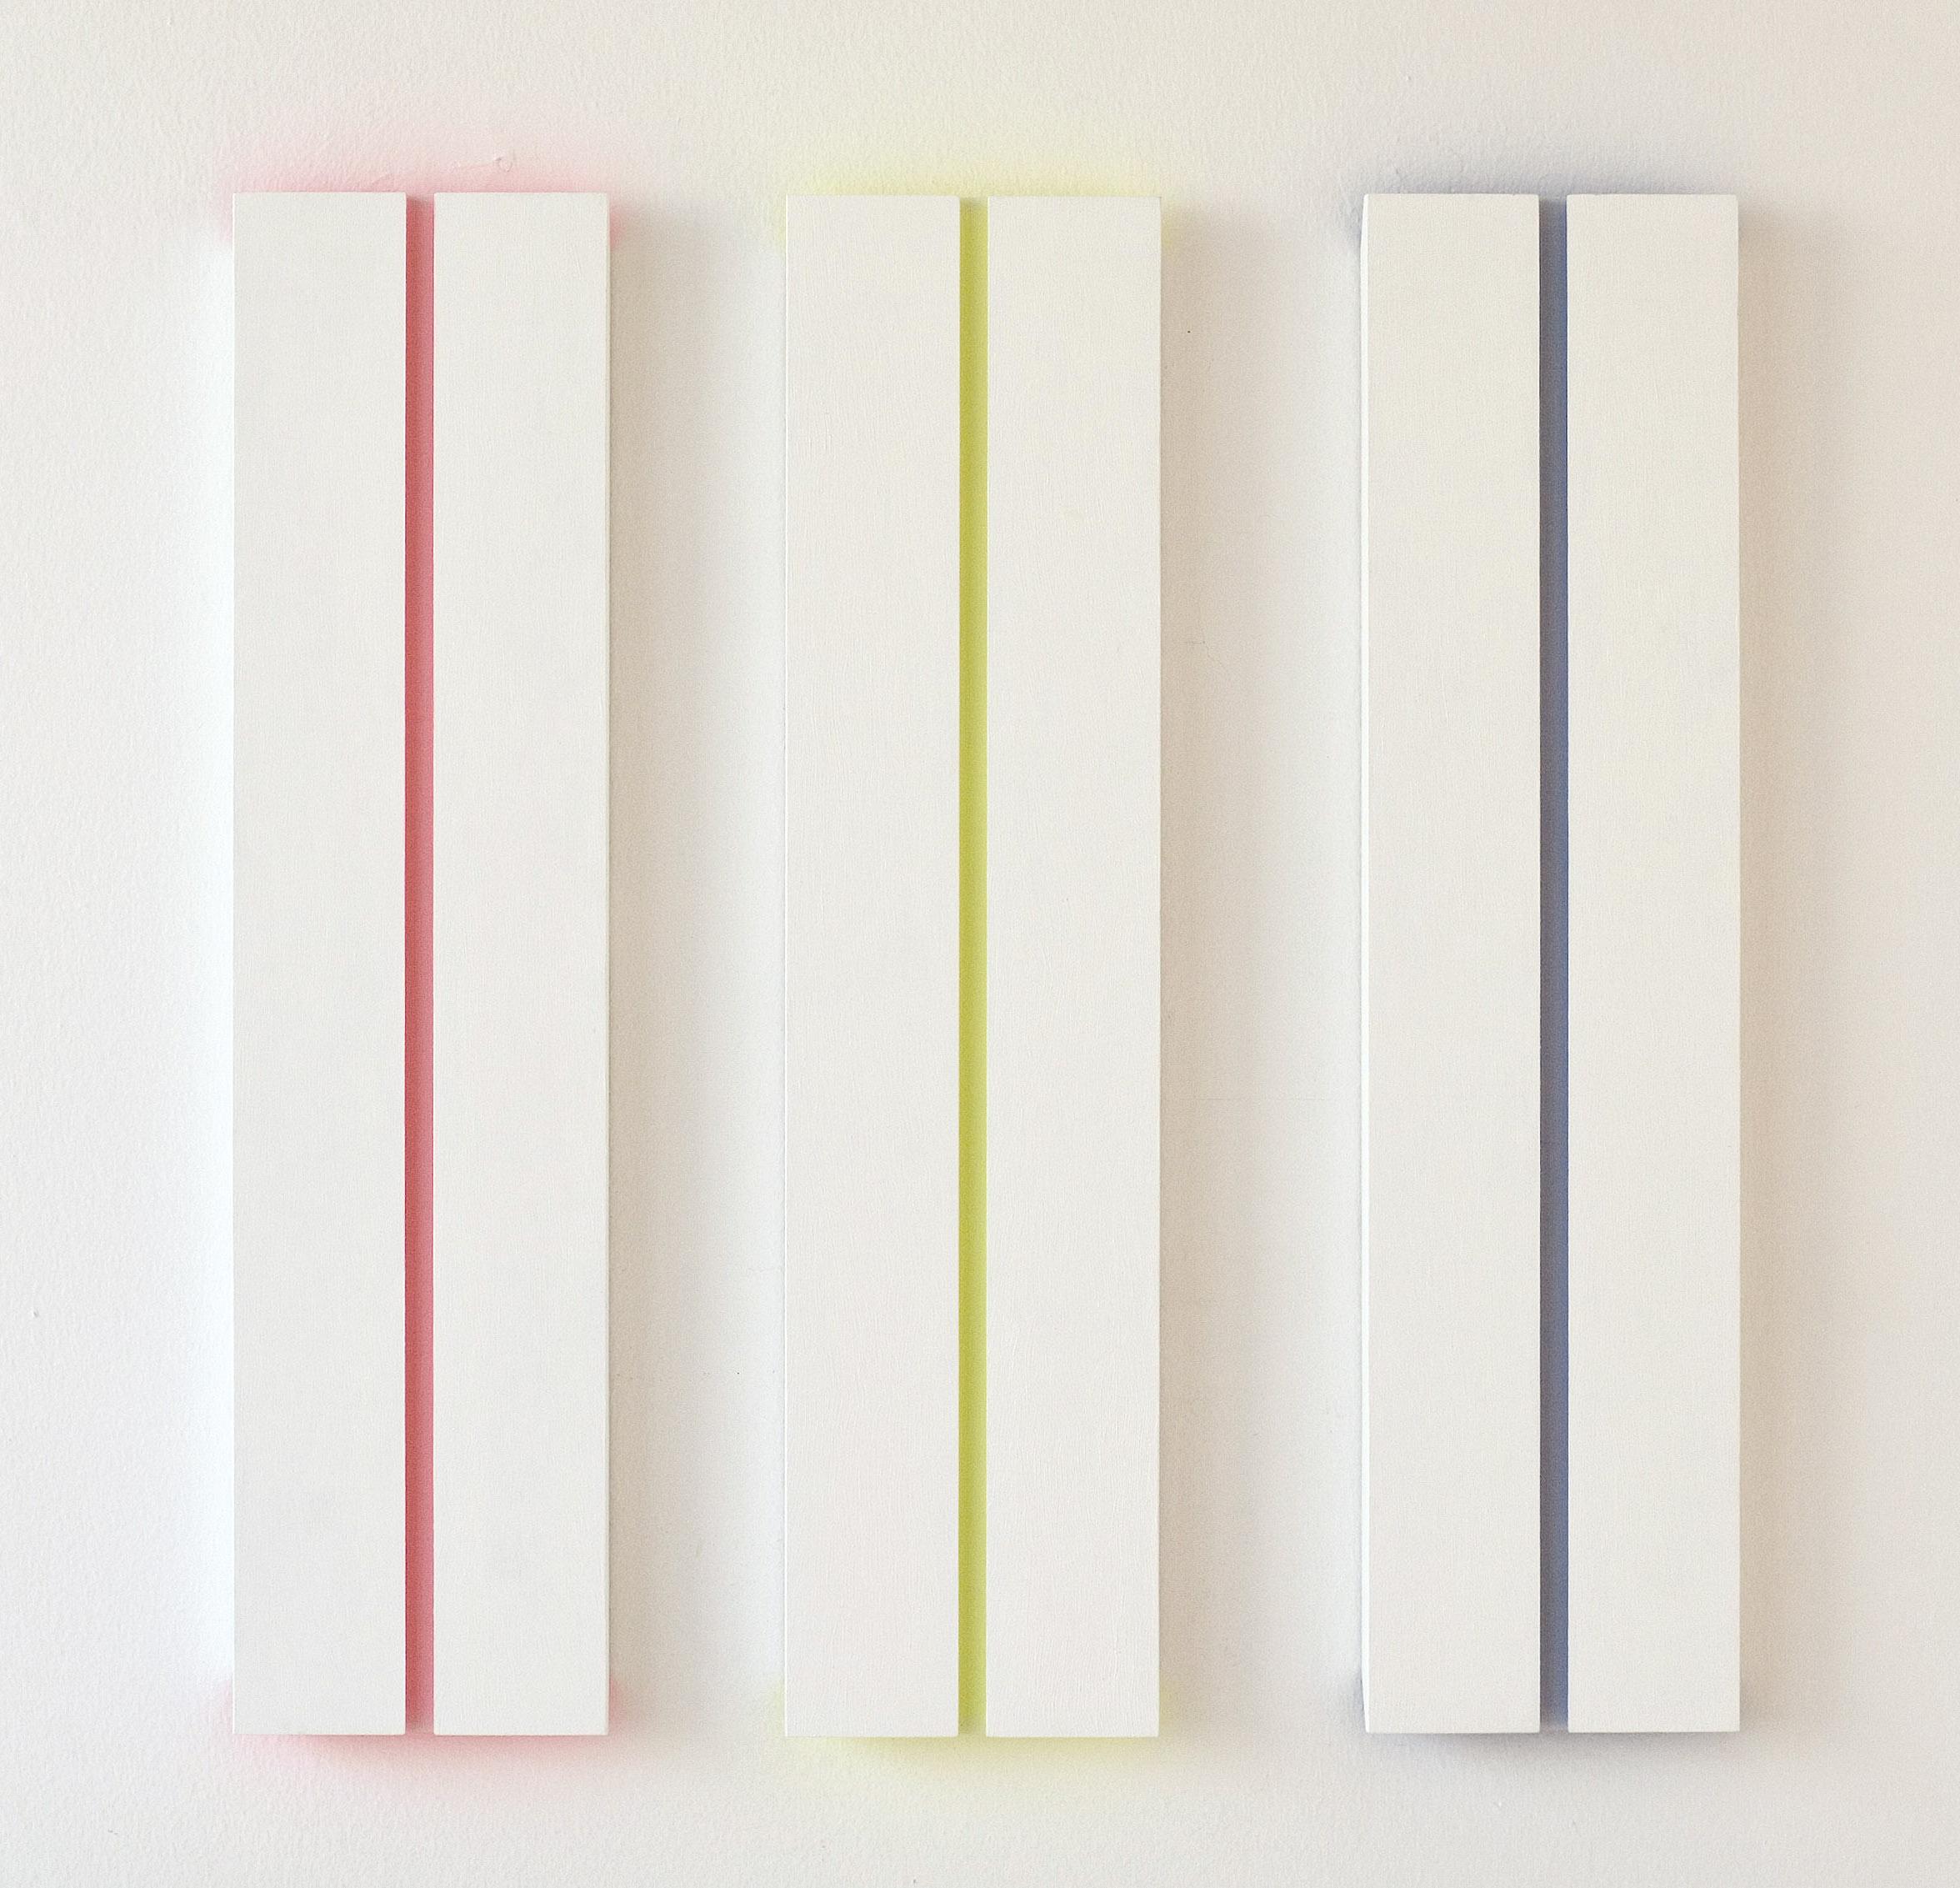 akril, les, trikrat 120 x 30 cm, 2005